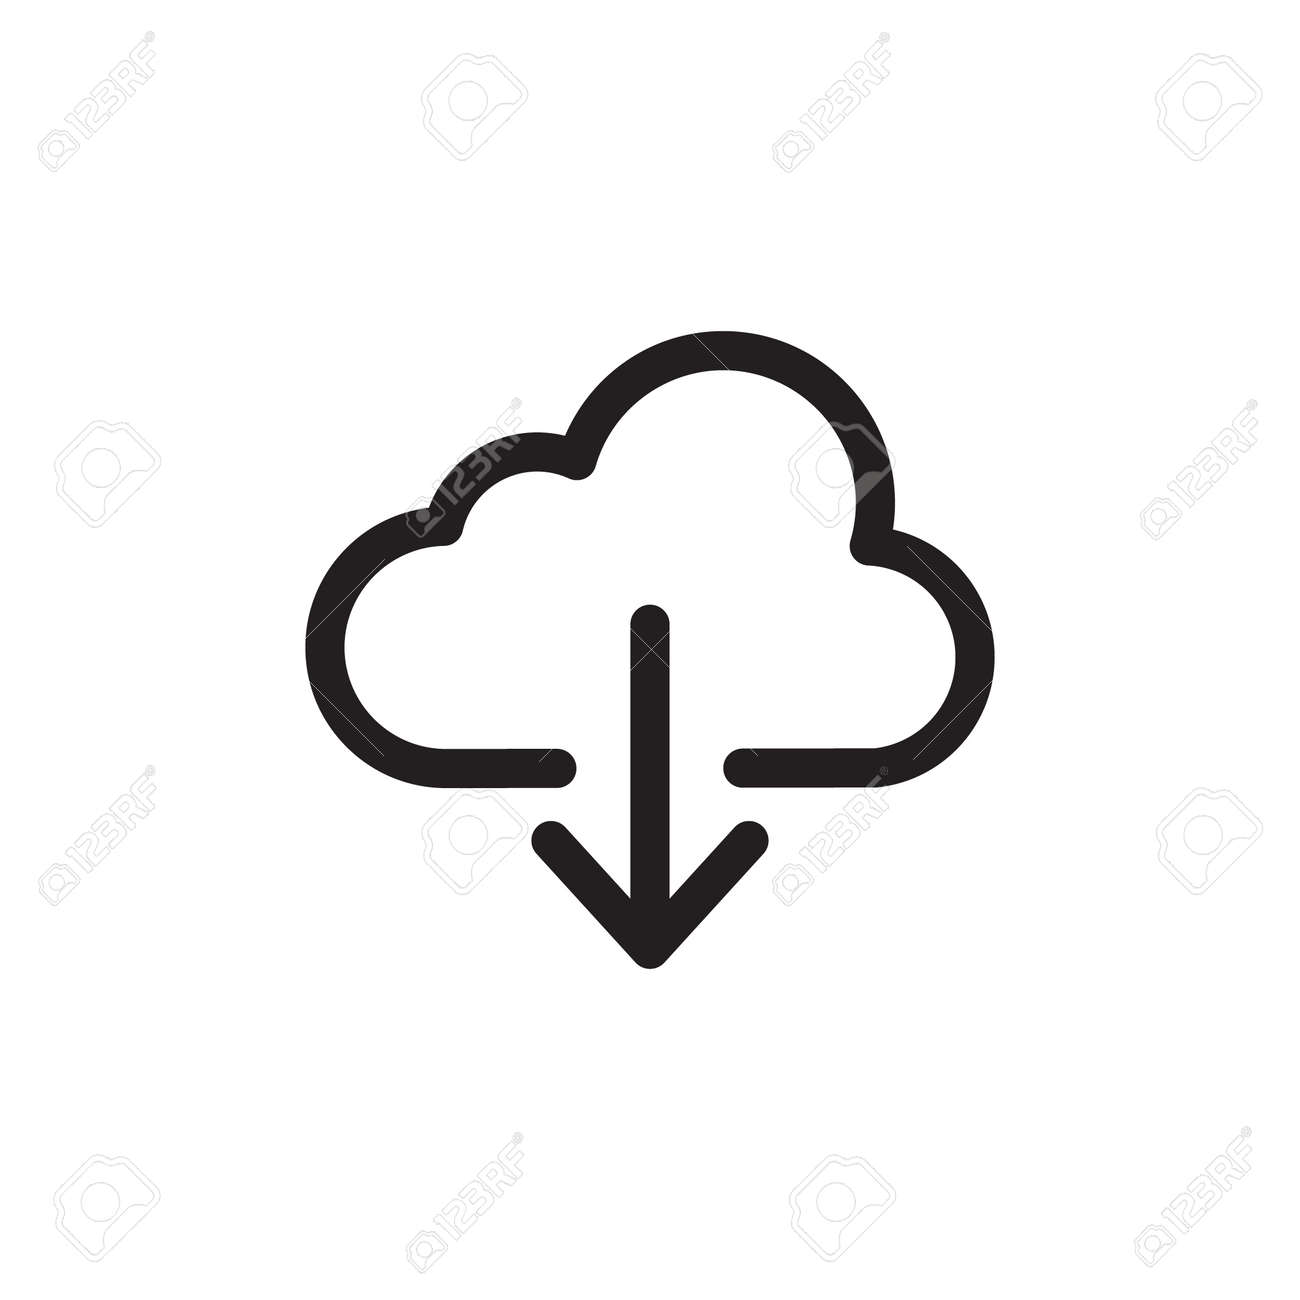 Cloud Download Icon In Trendy Design Vector - 150099390